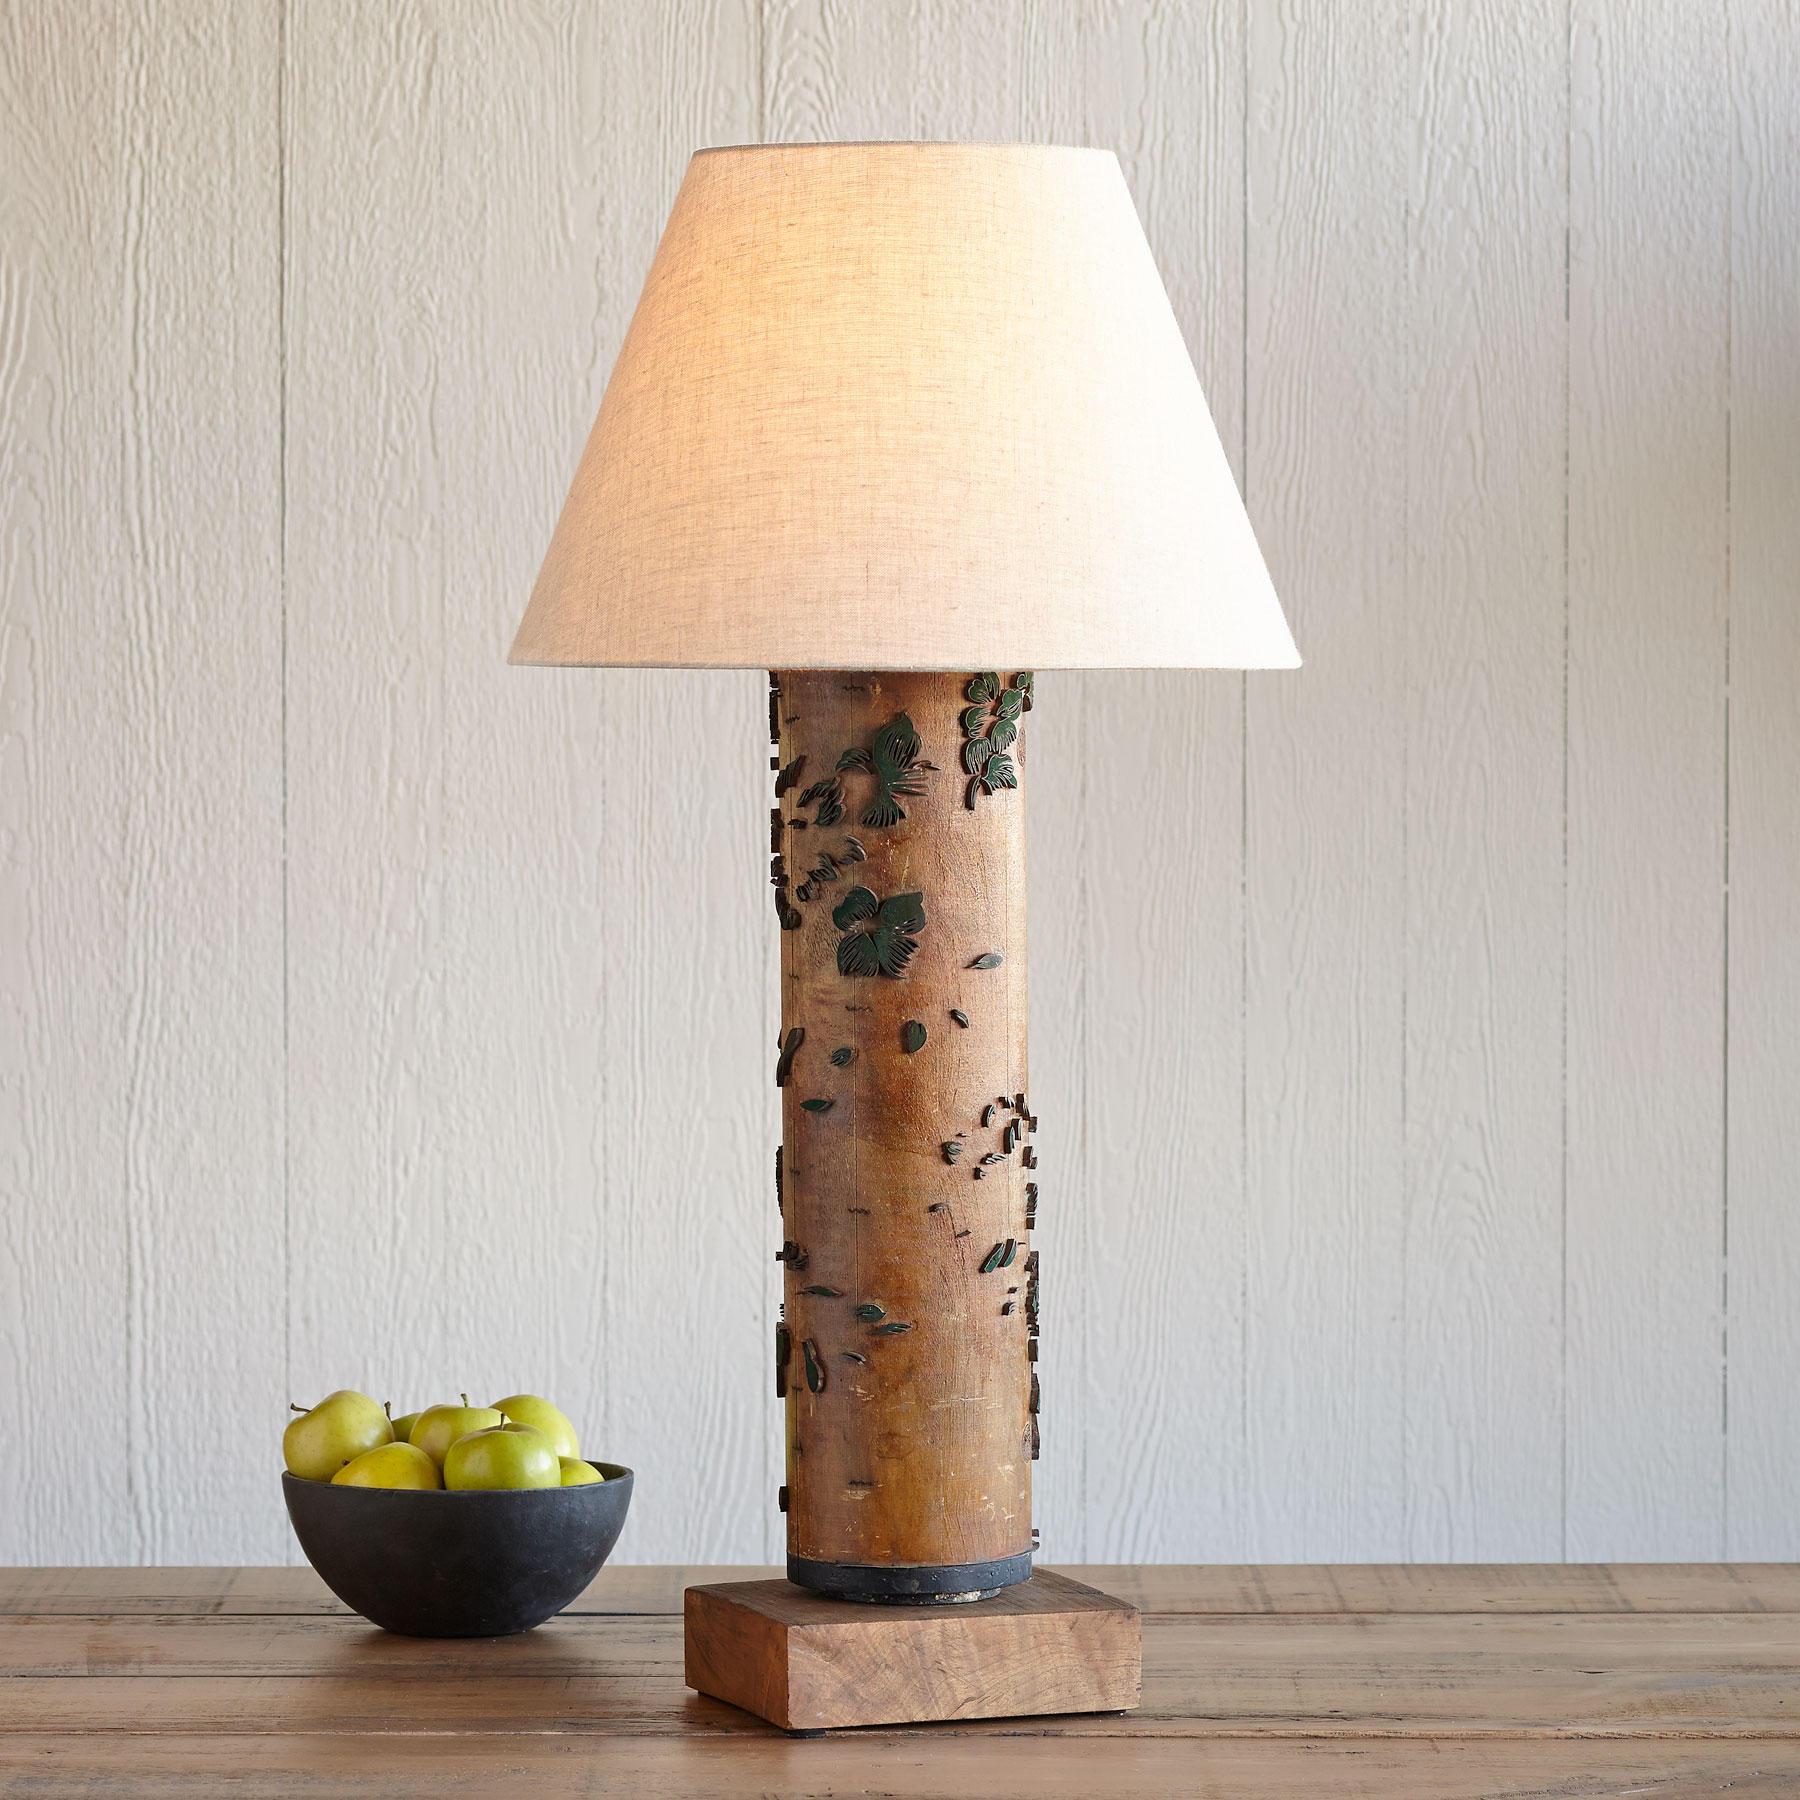 One-of-a-kind Buckingham Vintage Roller Lamp